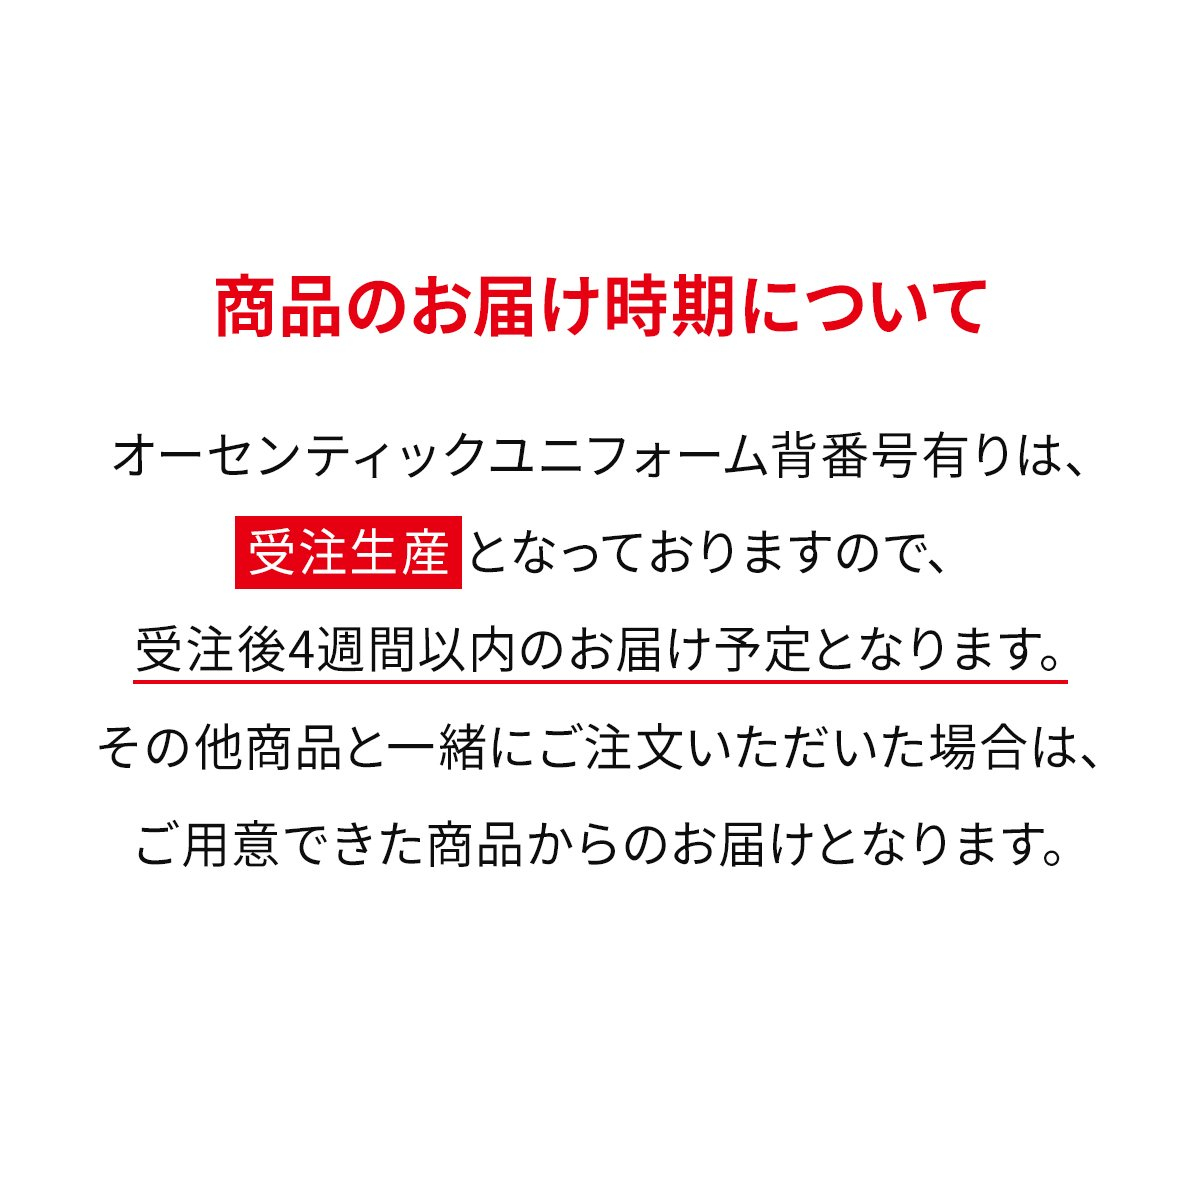 <img class='new_mark_img1' src='https://img.shop-pro.jp/img/new/icons8.gif' style='border:none;display:inline;margin:0px;padding:0px;width:auto;' />沖縄SV(OSV) 2020 オーセンティックユニフォーム GK1st